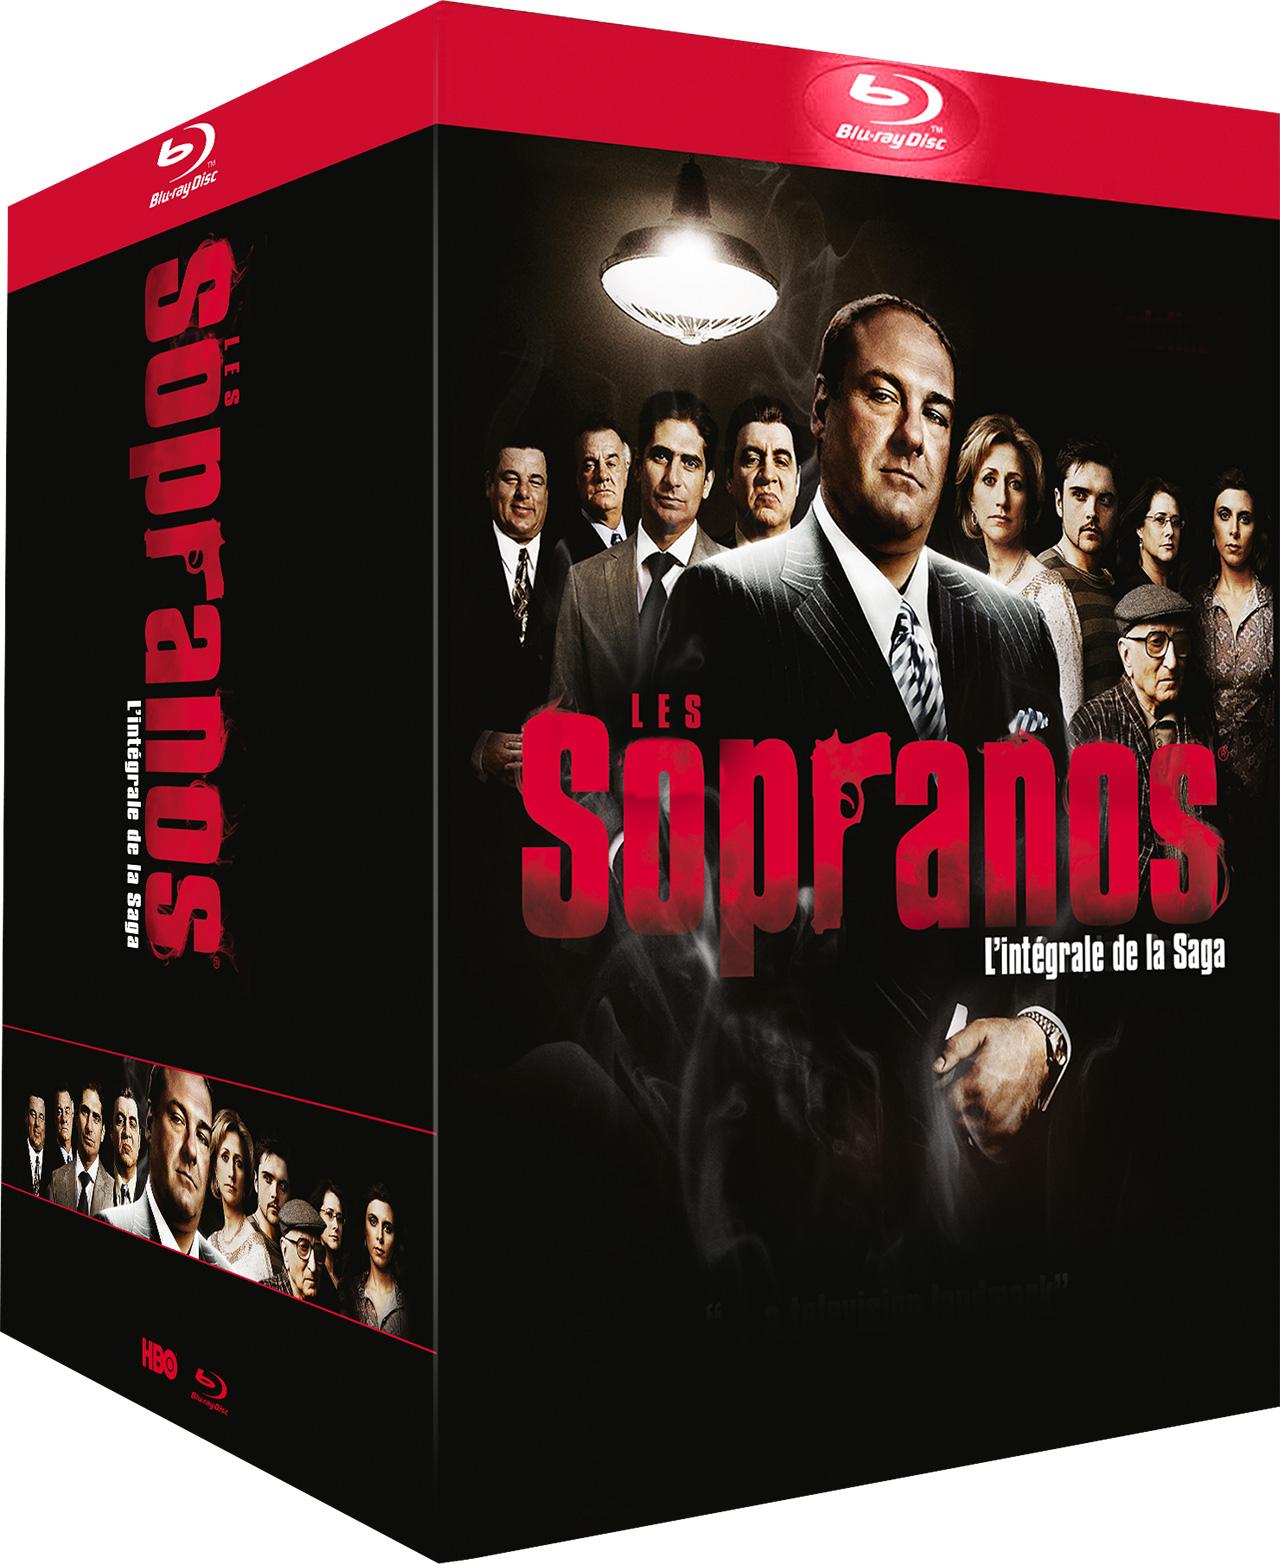 Les Soprano - Intégrale Blu-ray